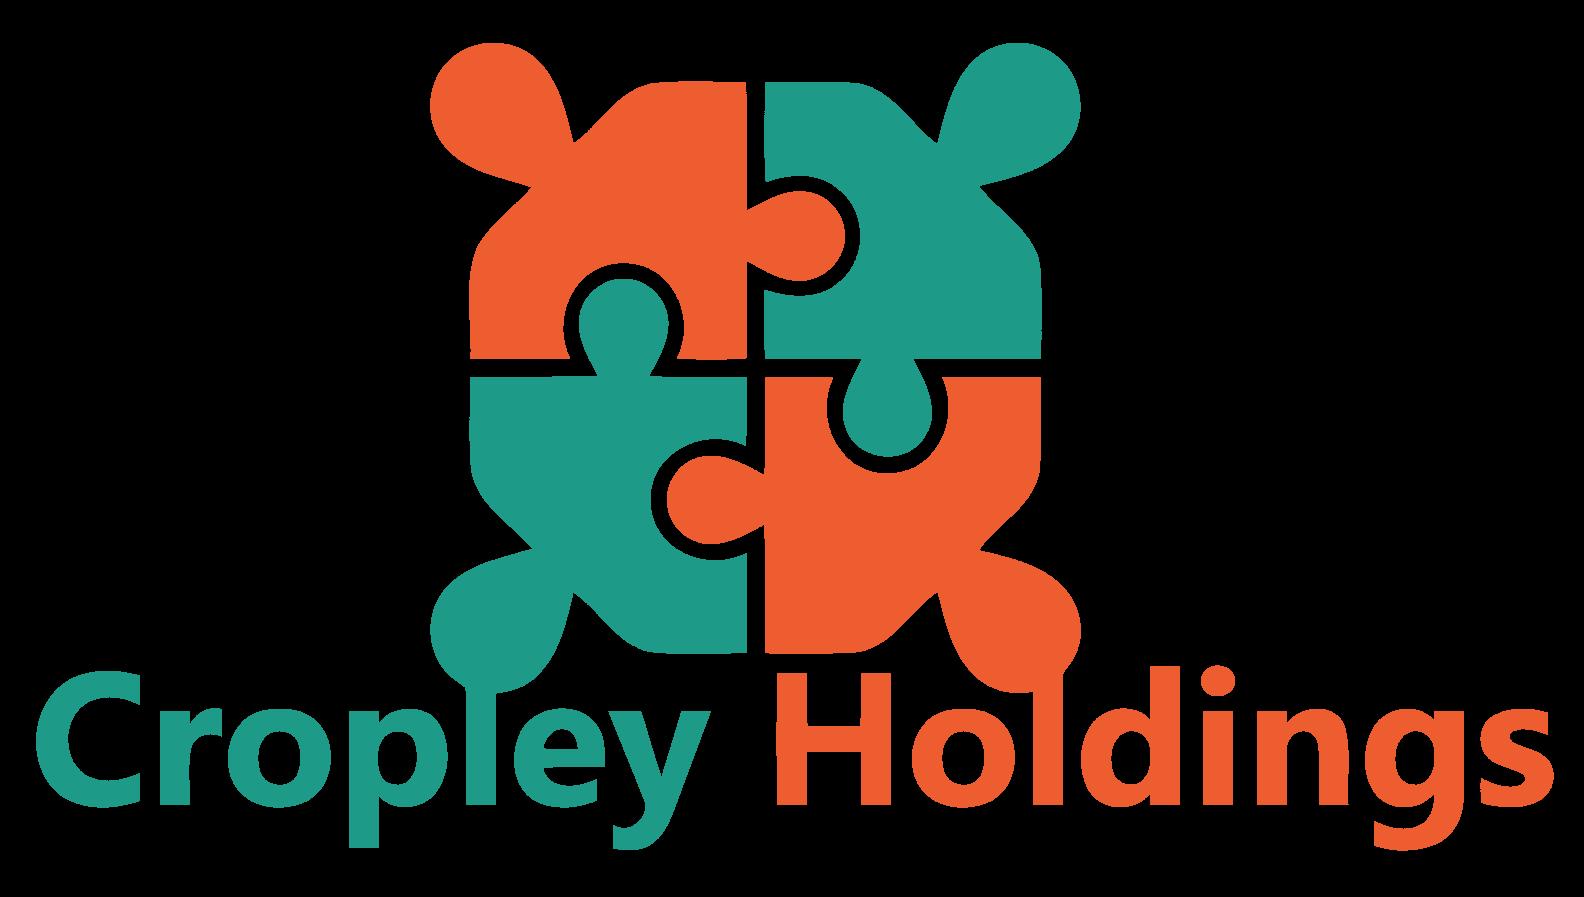 Cropley Holdings